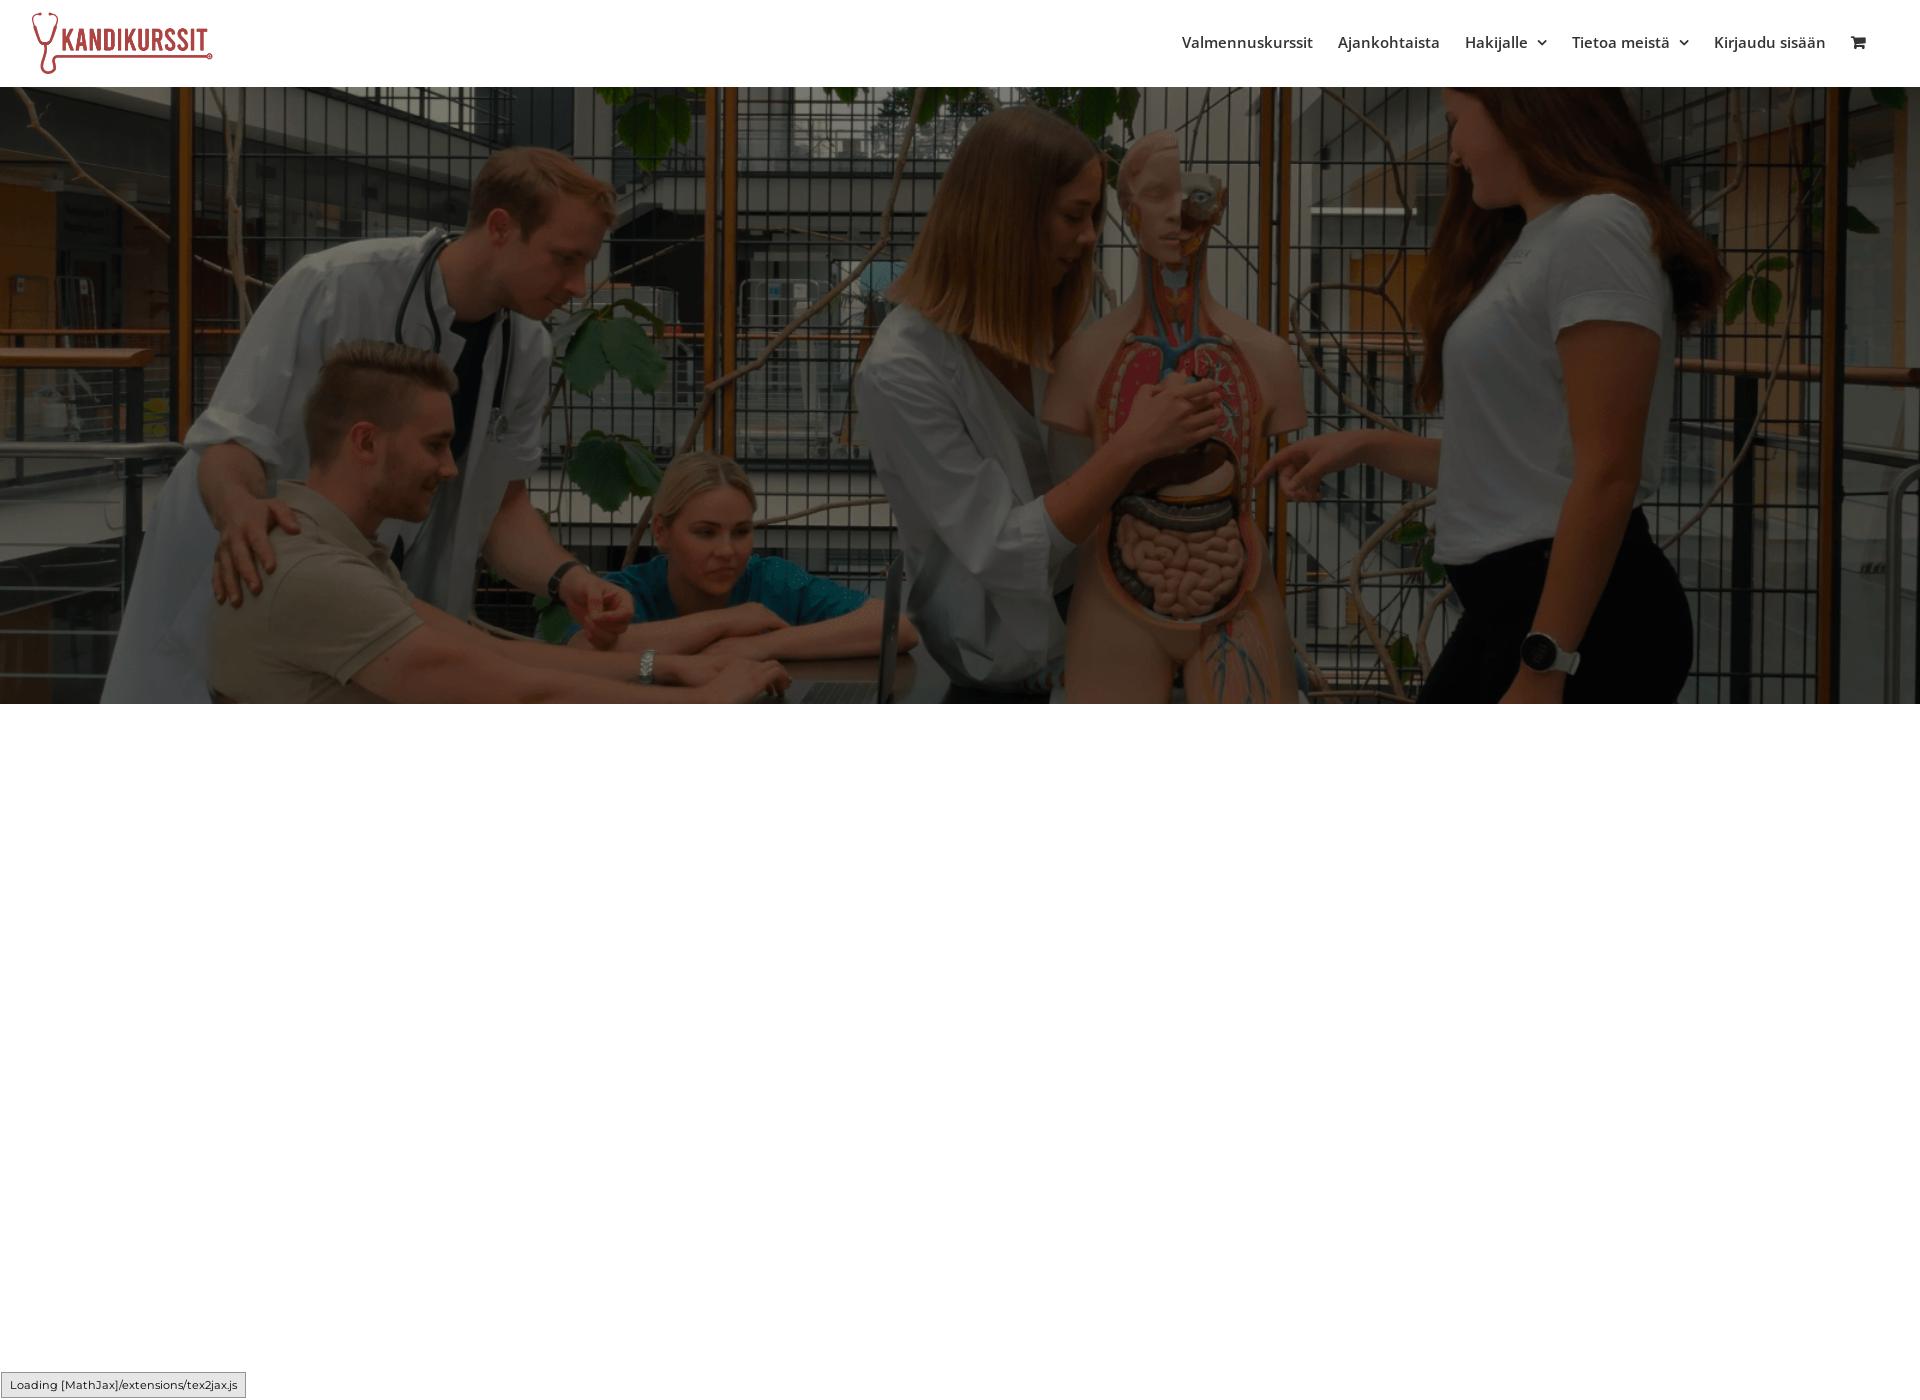 Screenshot for stadinlääkiksenvalmennuskurssit.fi